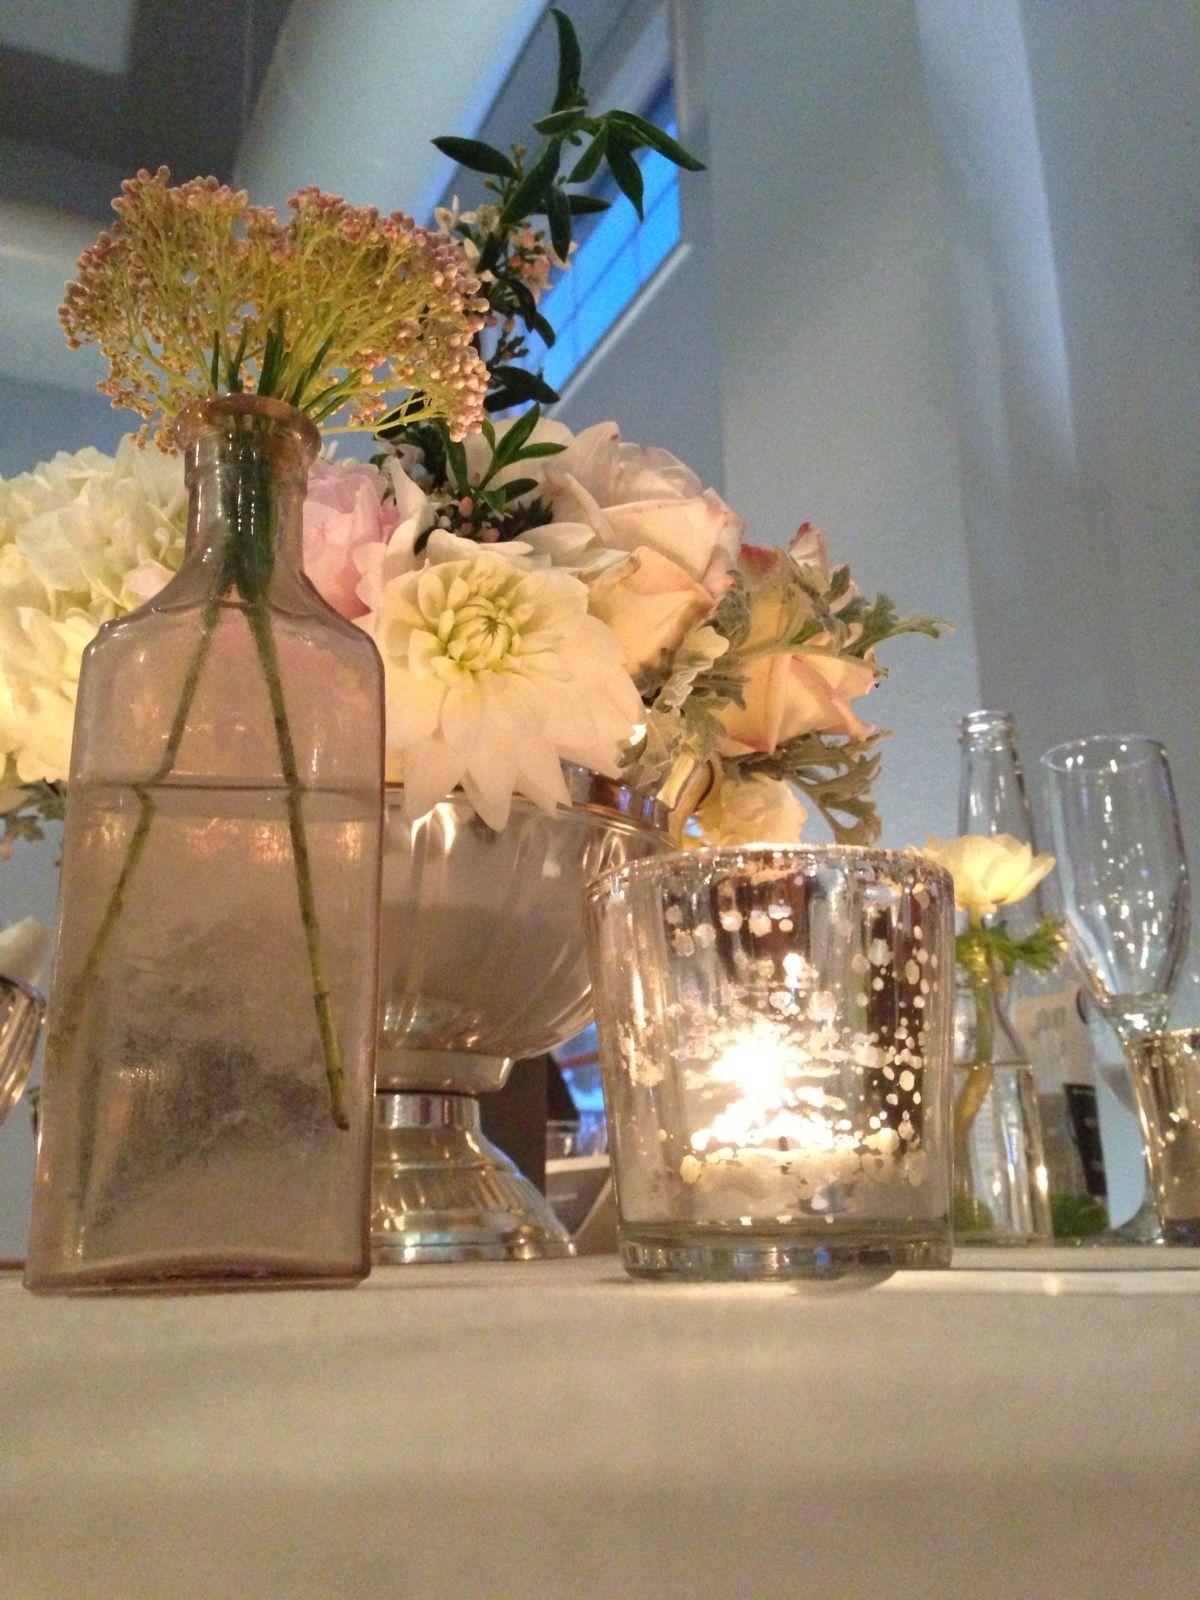 Wedding Table Decor Mercury Votive Candles And Bud Vases Silver Vintage Antique Centerpiece